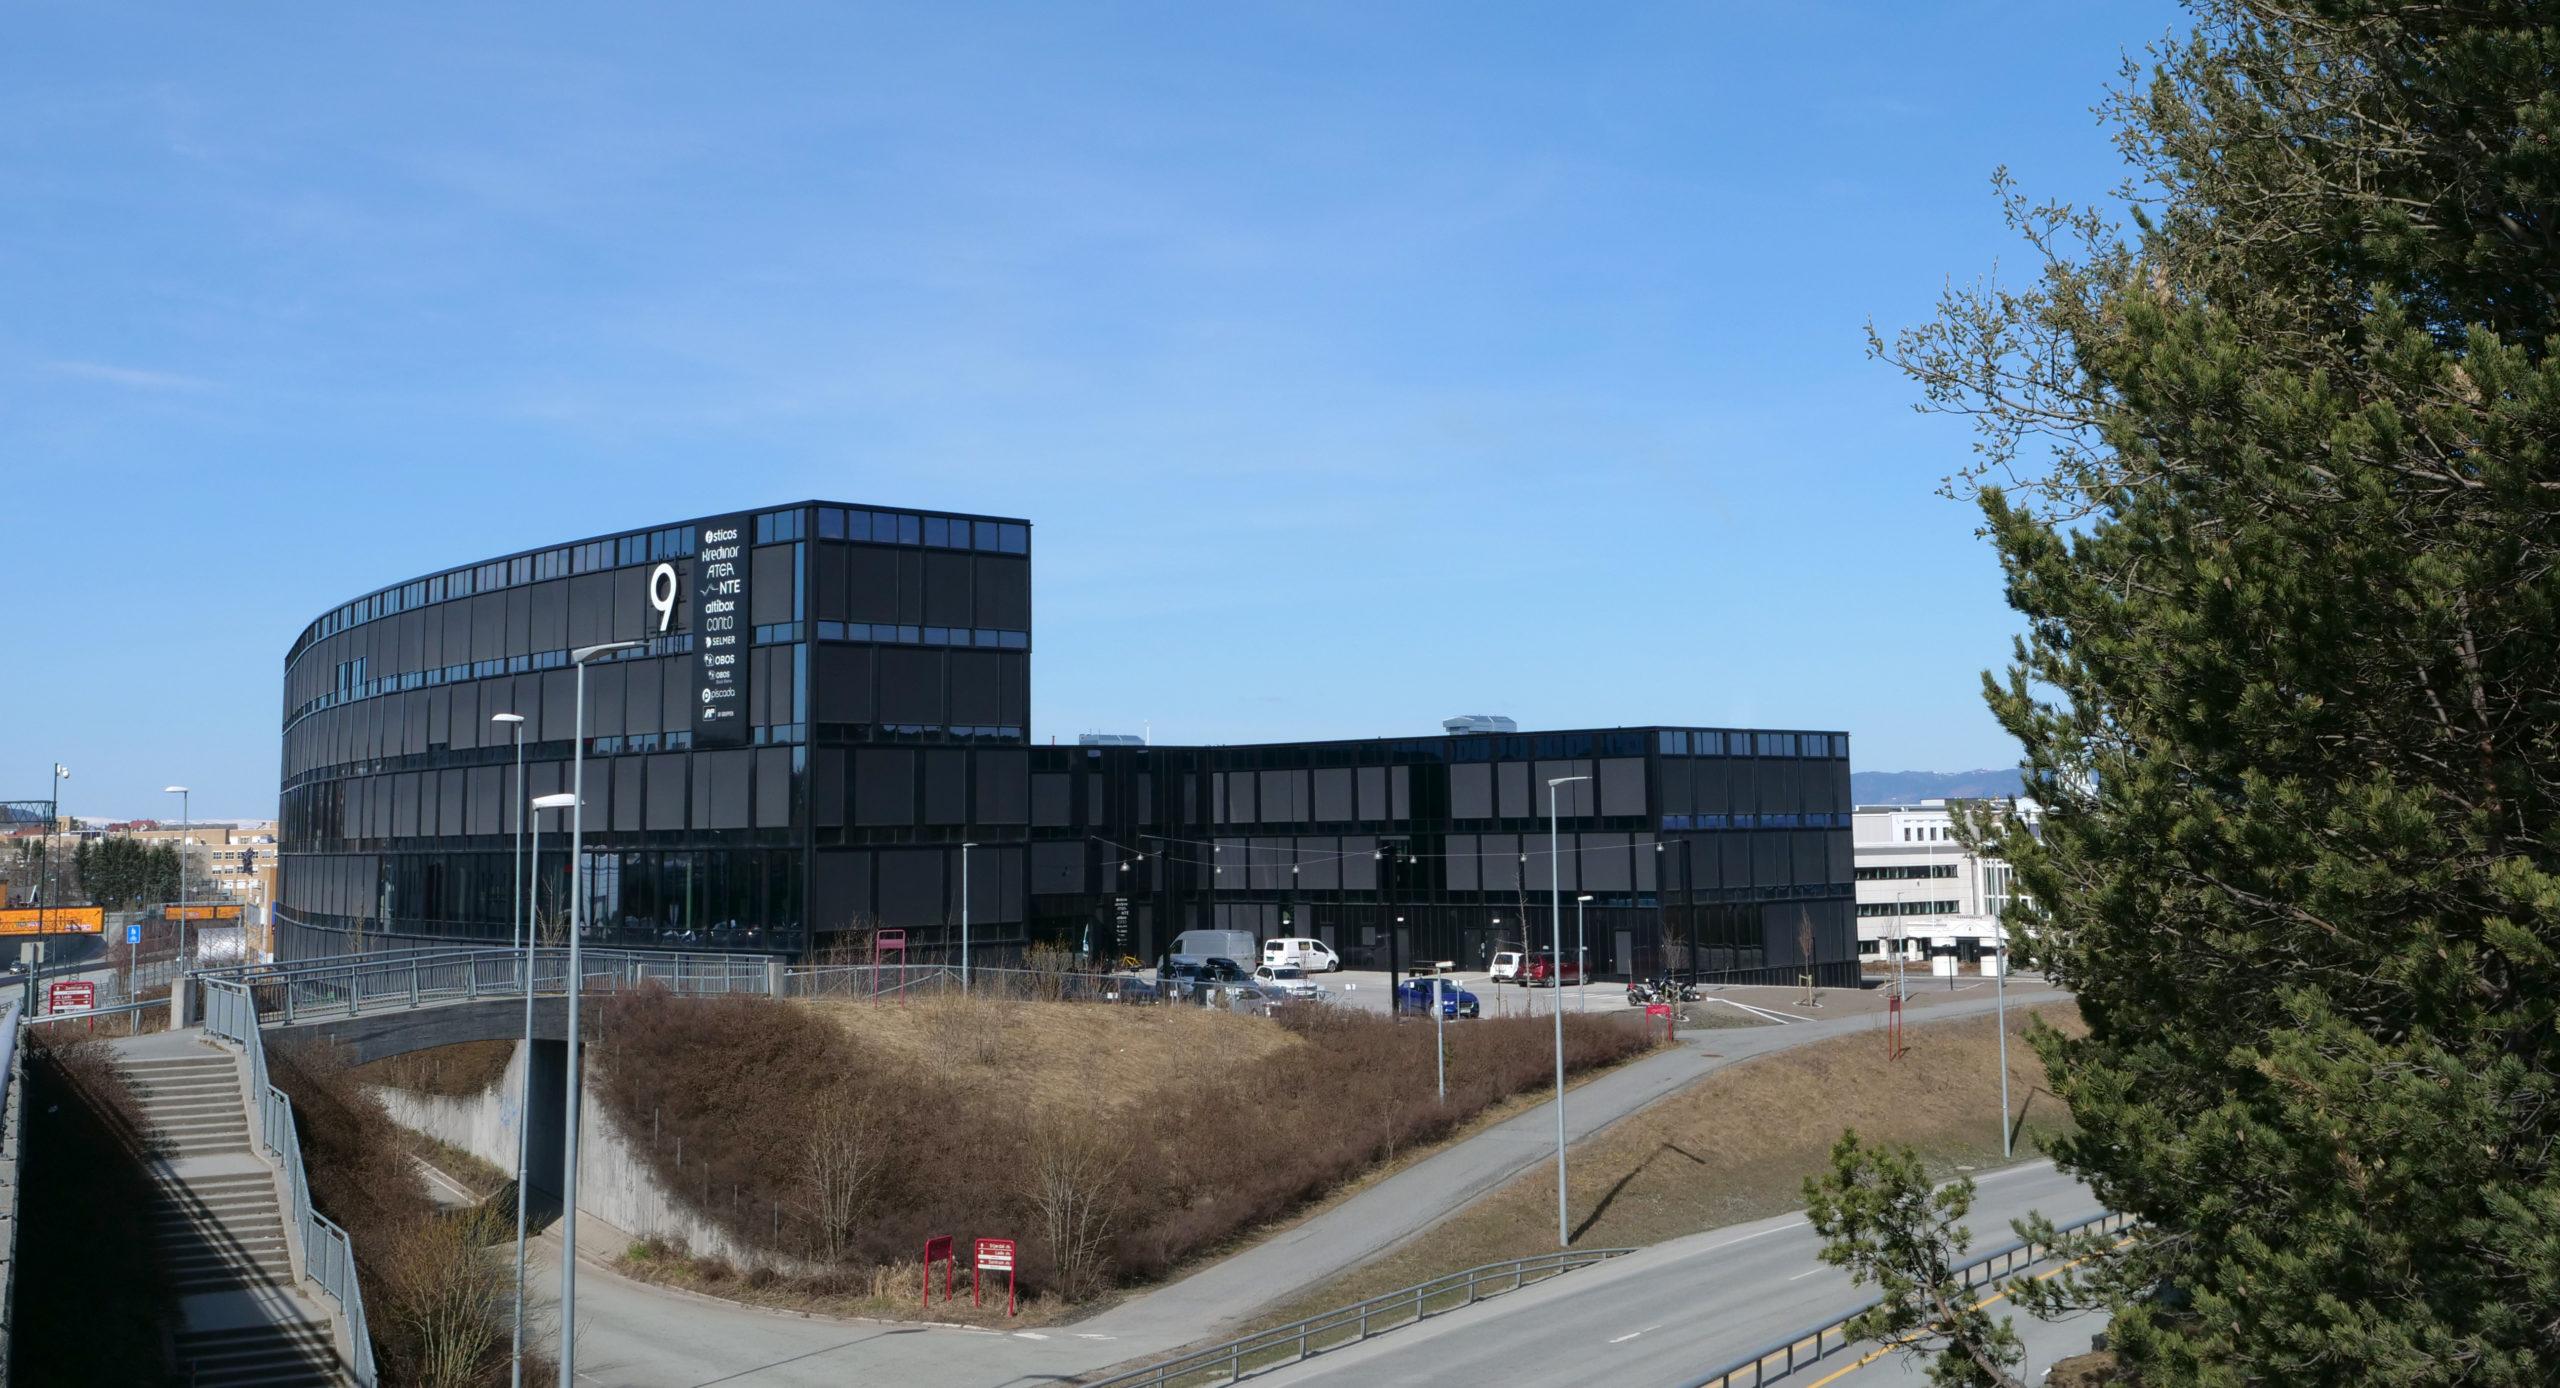 Ny bærekraftssertifisering til kontorbygg i Trondheim